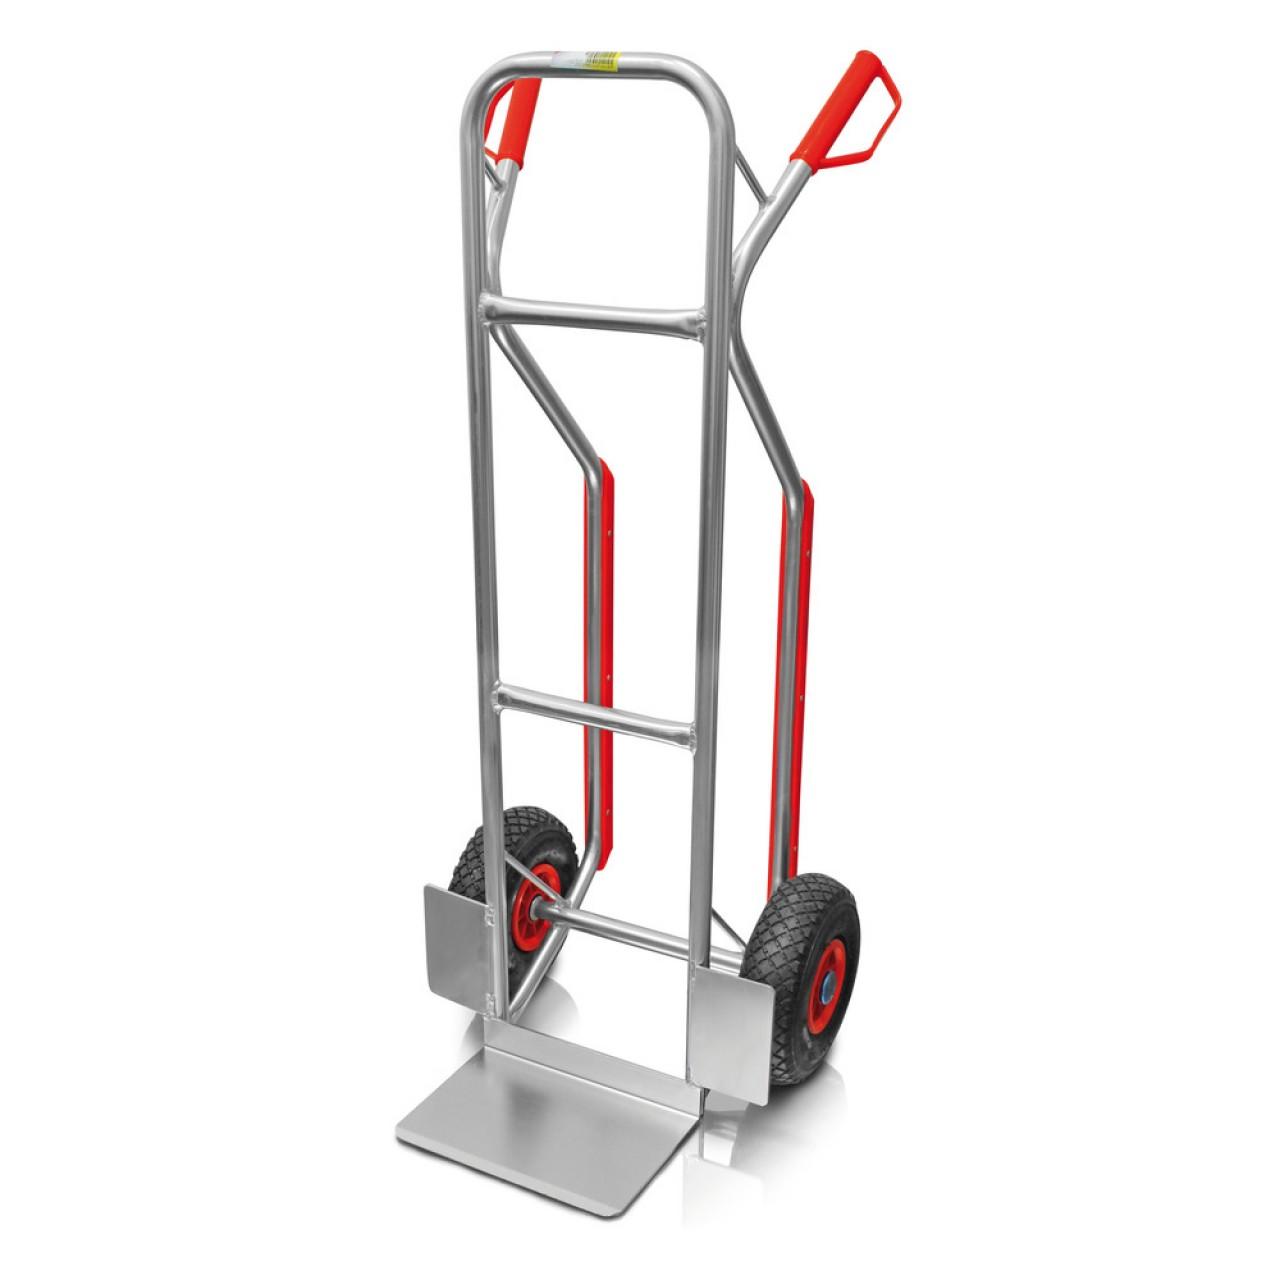 Profi Sackrodel Aluminium 200kg